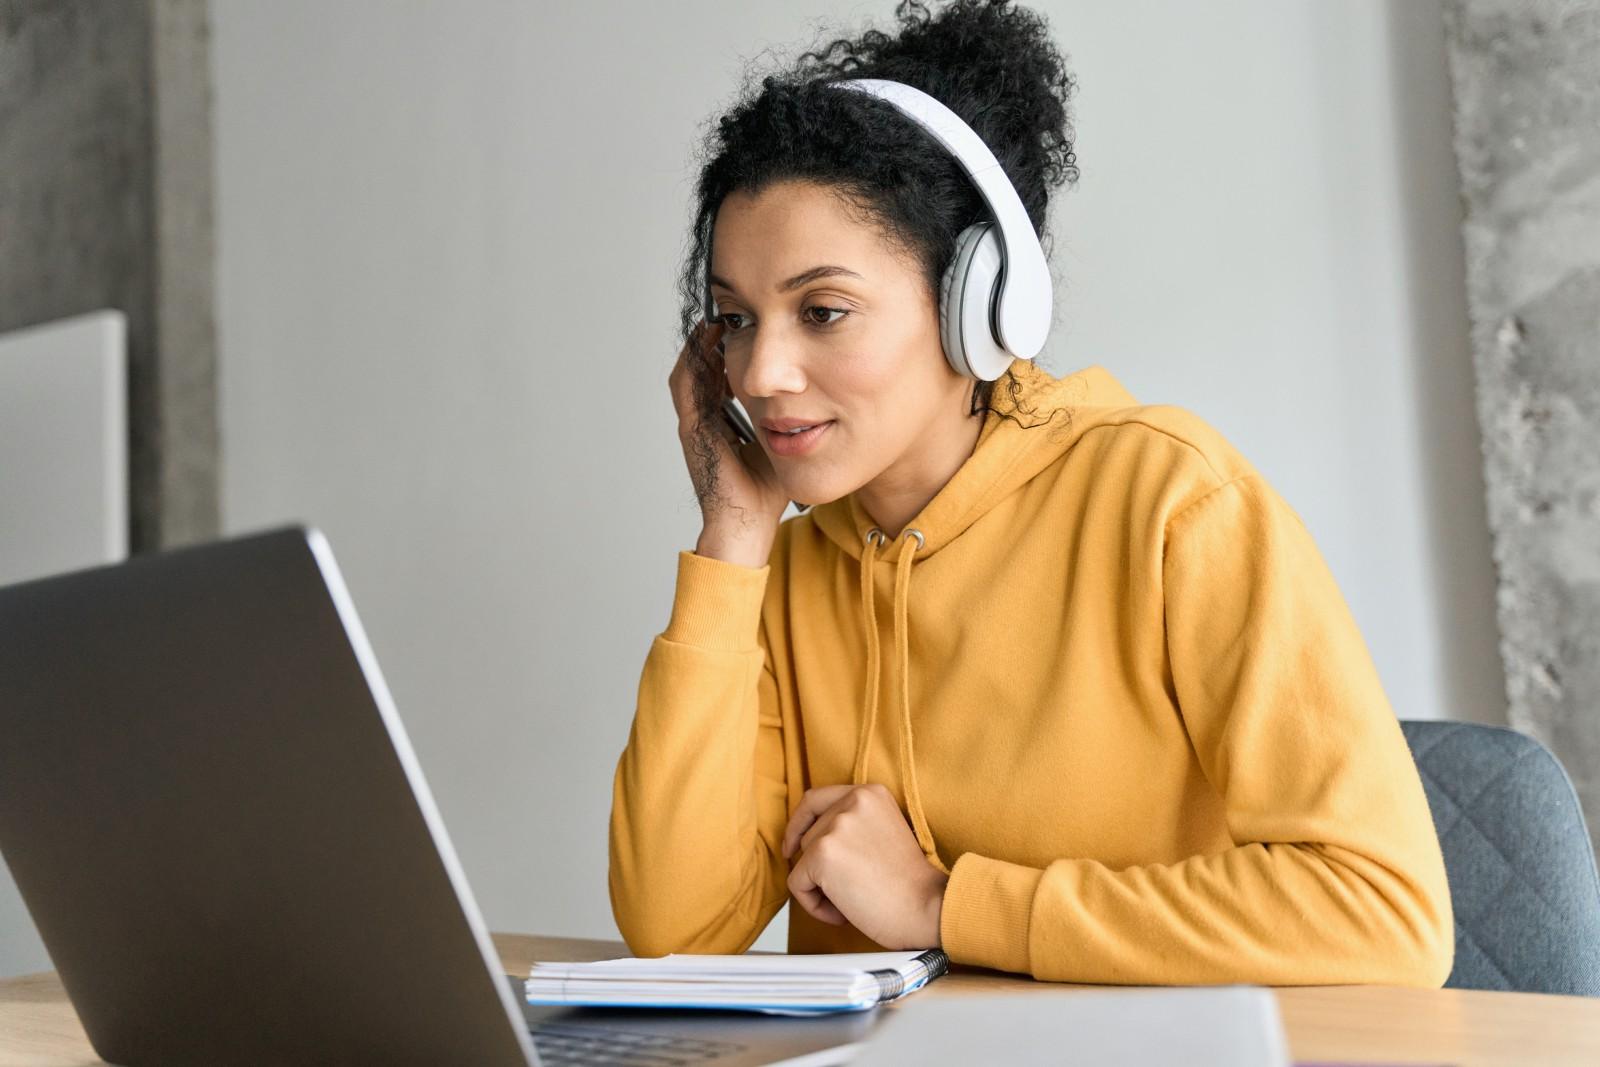 entrevistadeempregoonline - 3 dicas para entrevista de emprego on-line